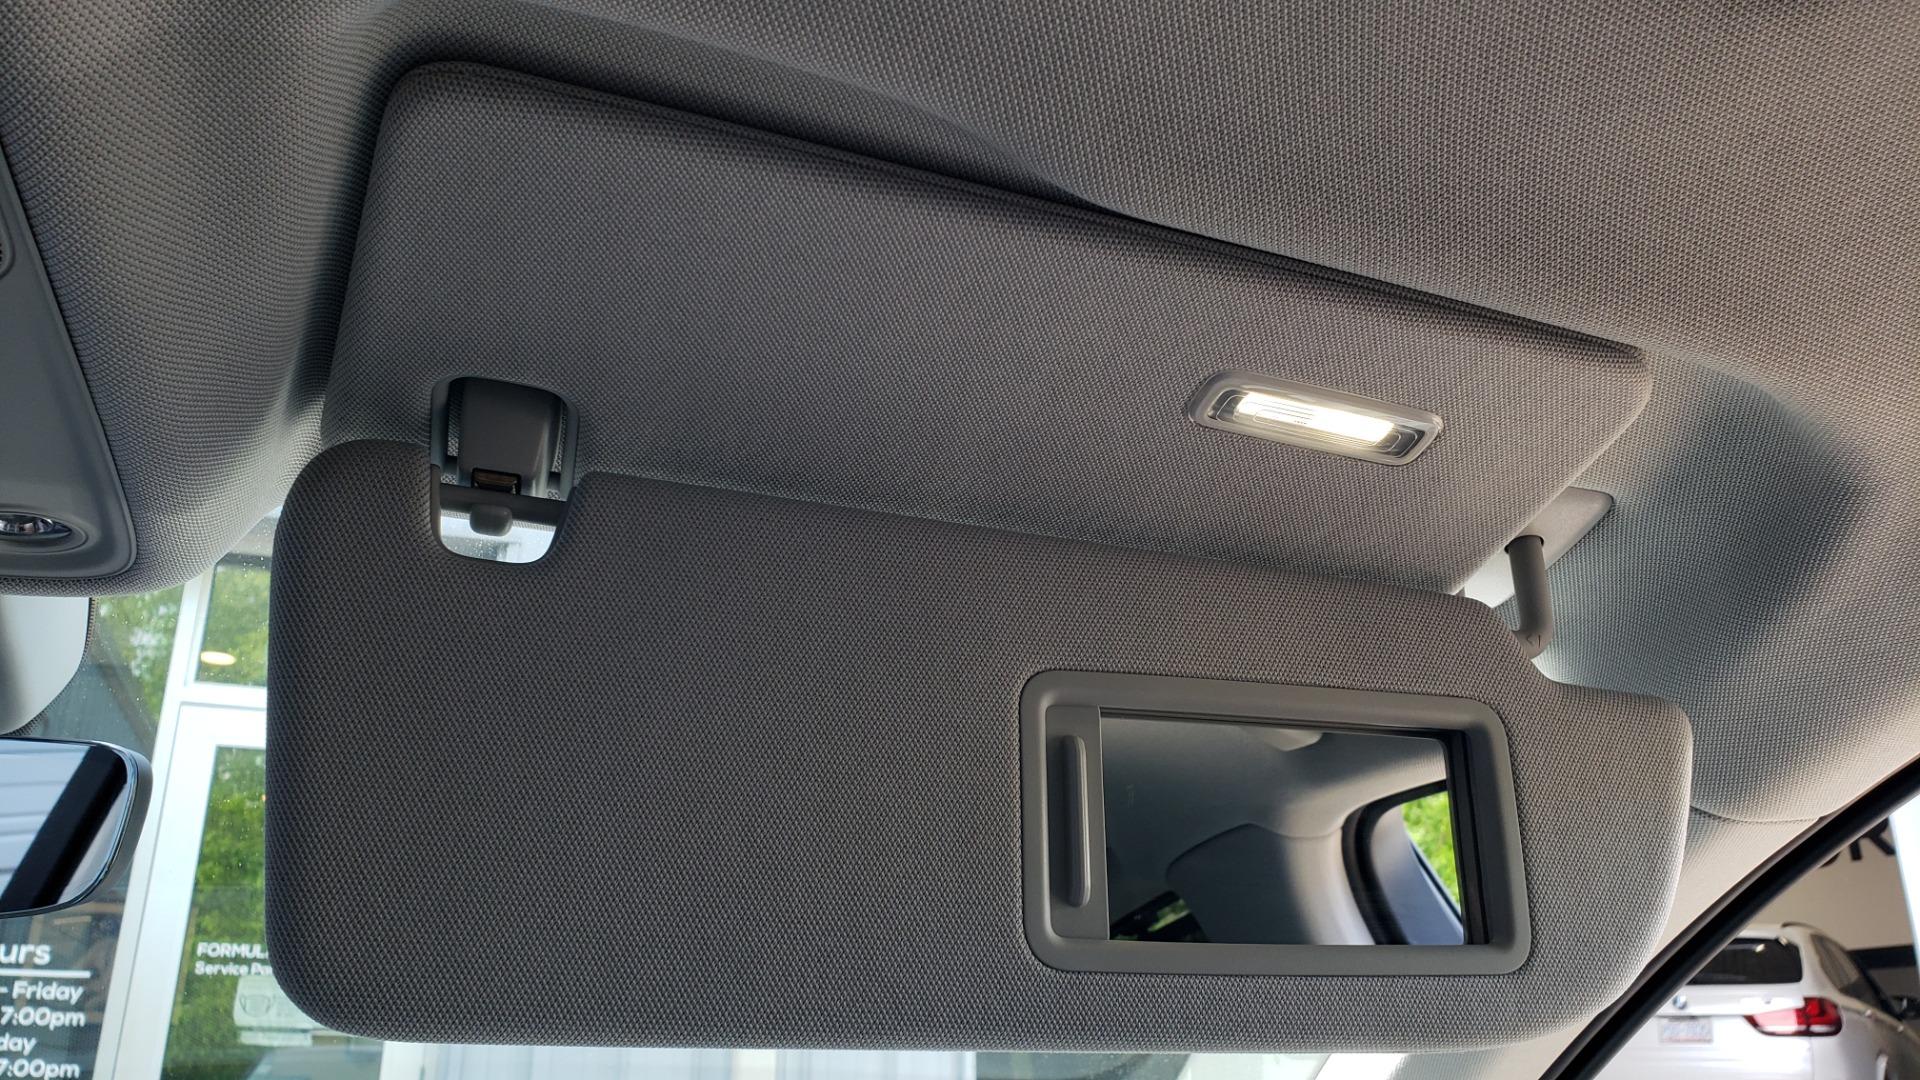 Used 2018 Audi Q7 PRESTIGE TIPTRONIC / NAV / SUNROOF / ADAPTIVE PKG / DRVR ASST / CLD WTHR /  for sale $49,995 at Formula Imports in Charlotte NC 28227 51